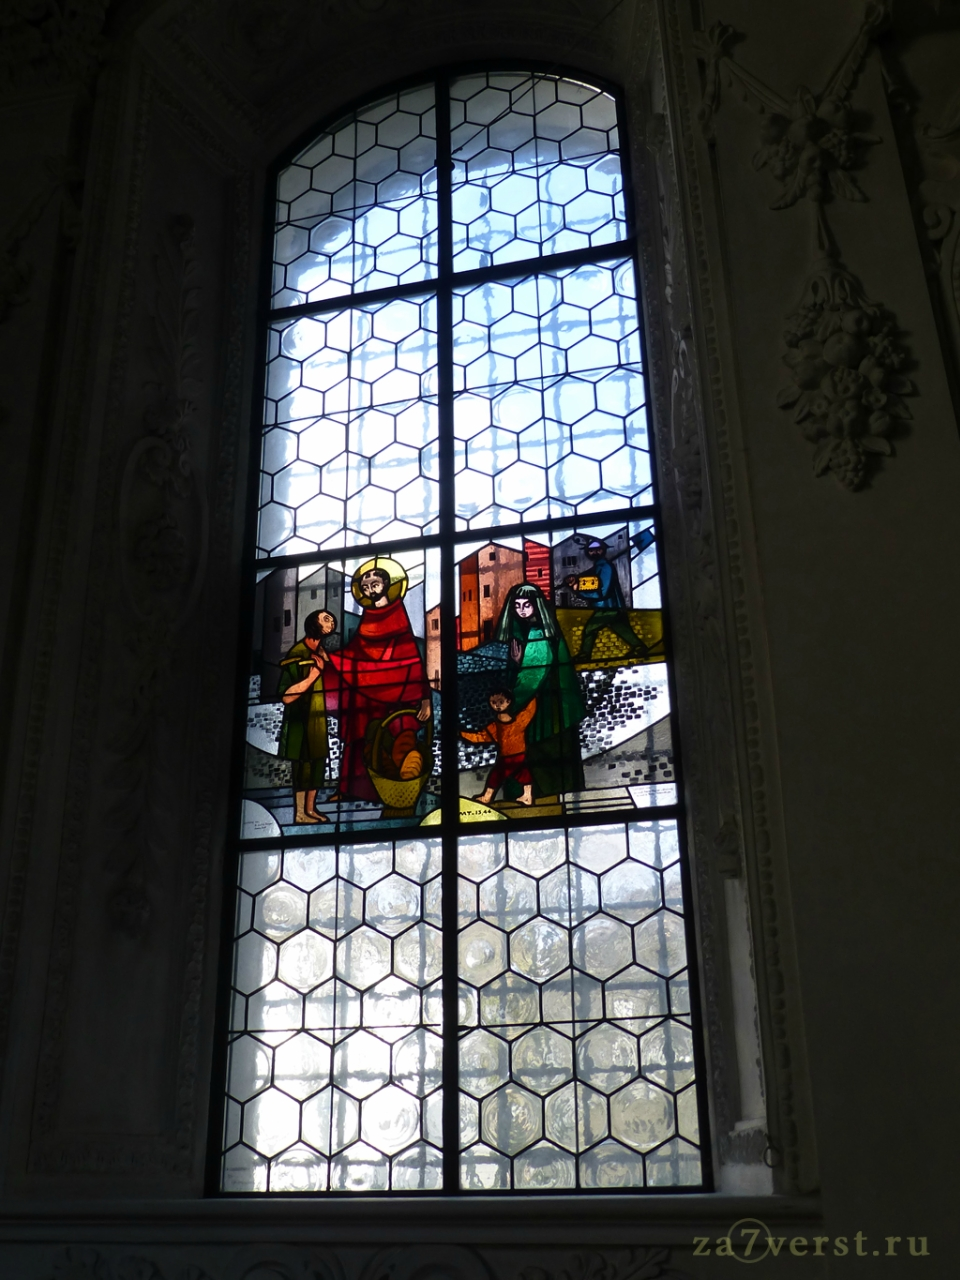 Францисканская церковь, Люцерн, Швейцария